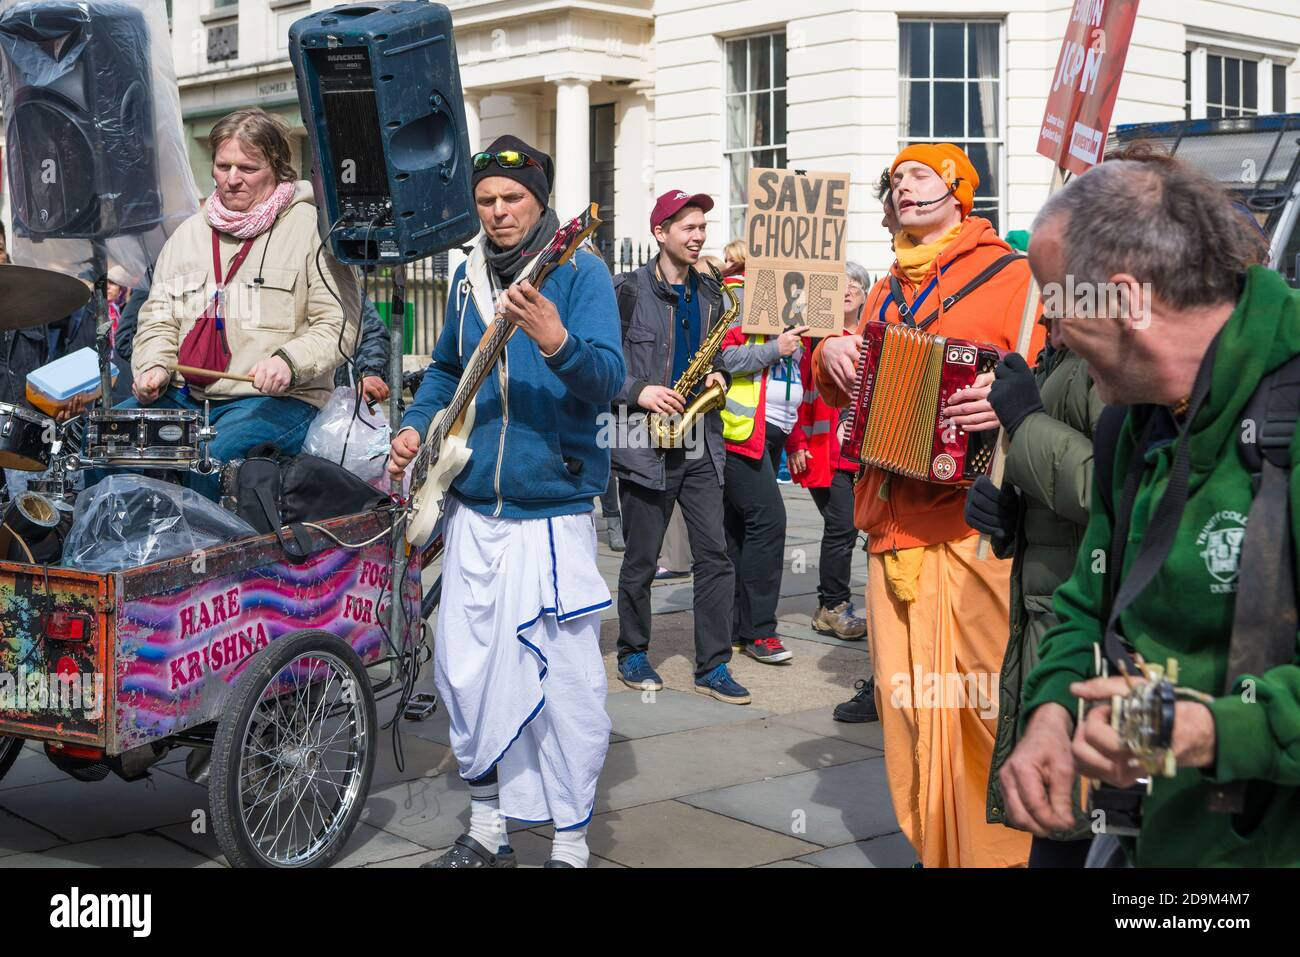 a-band-of-hare-krishna-musicians-enterta